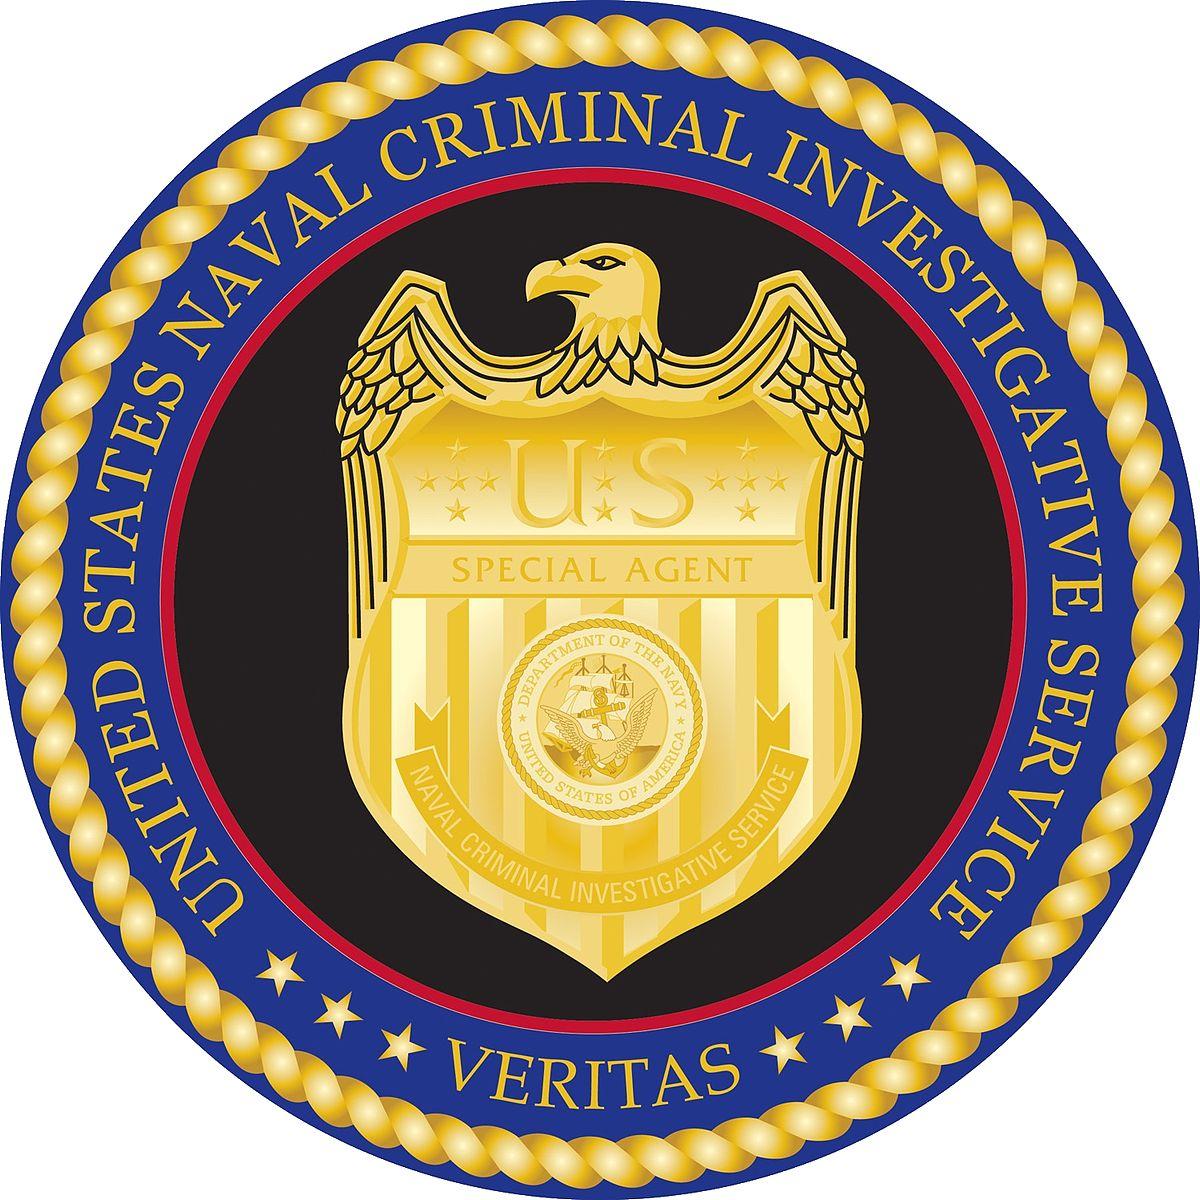 Naval Criminal Investigative Service.